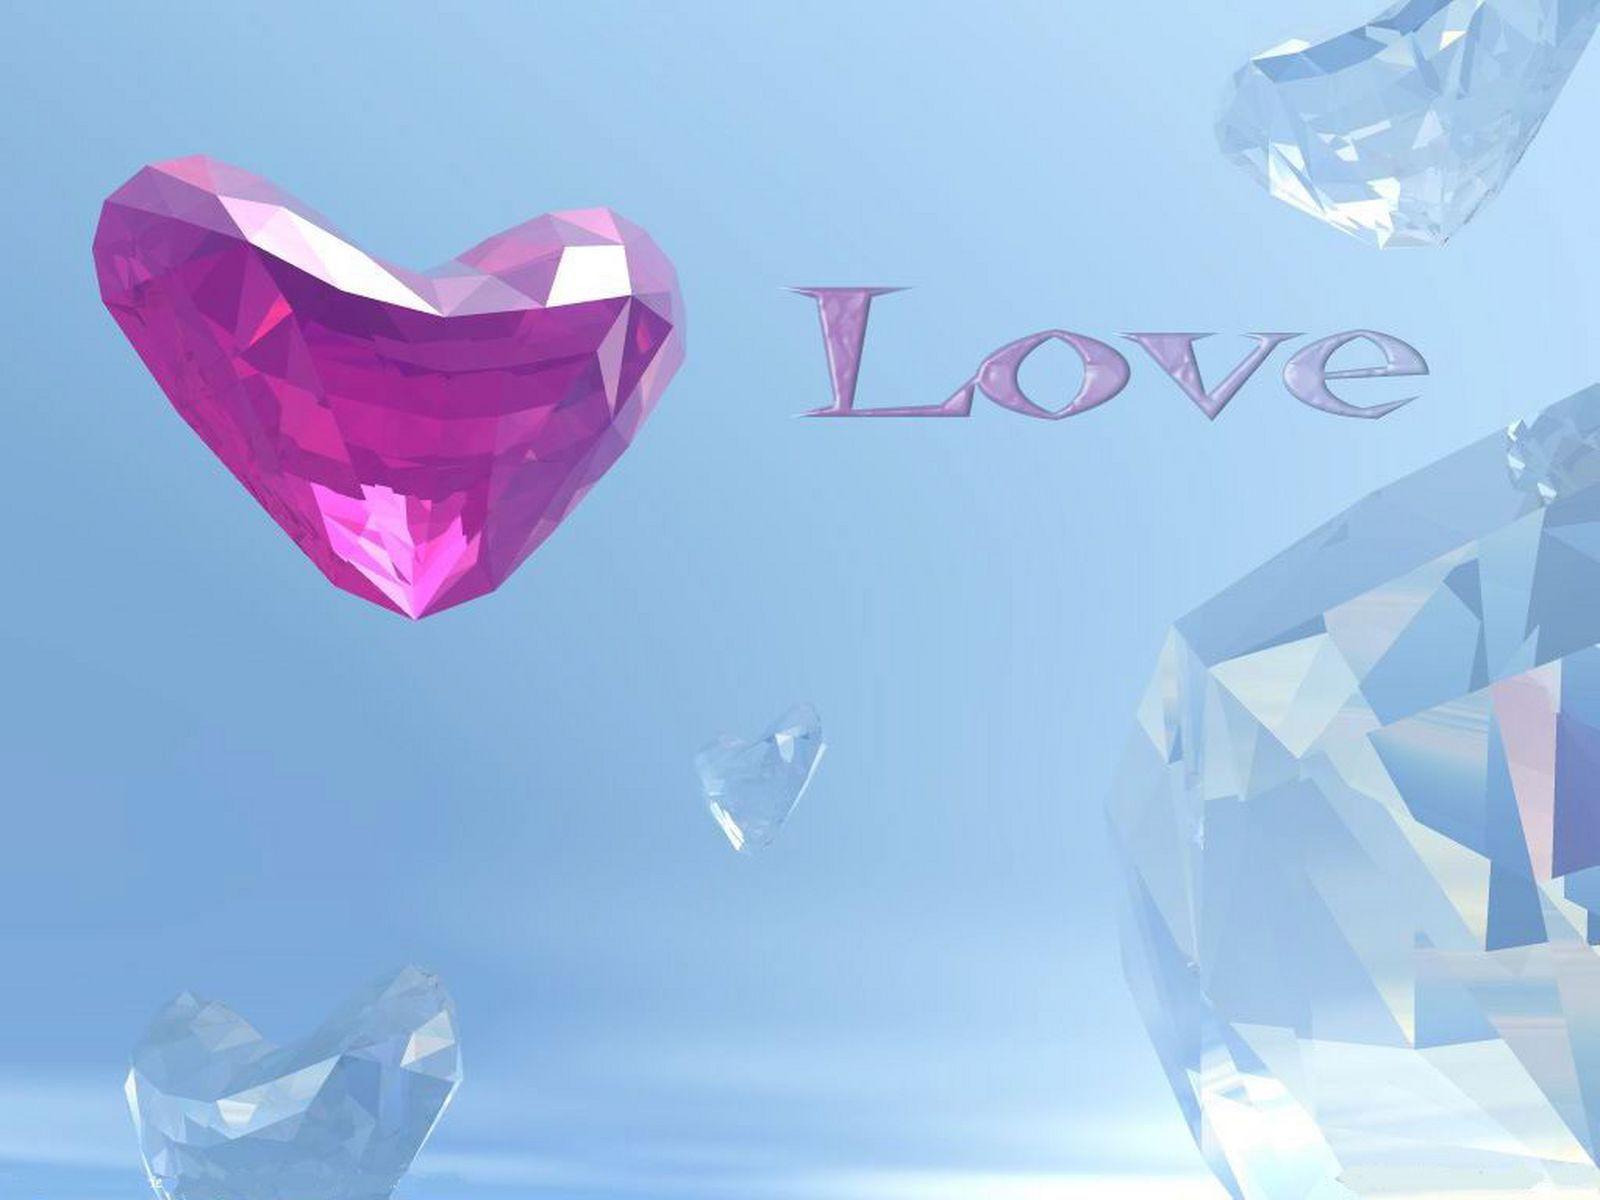 new love photos wallpaper, photos to wallpaper - best 2 travel